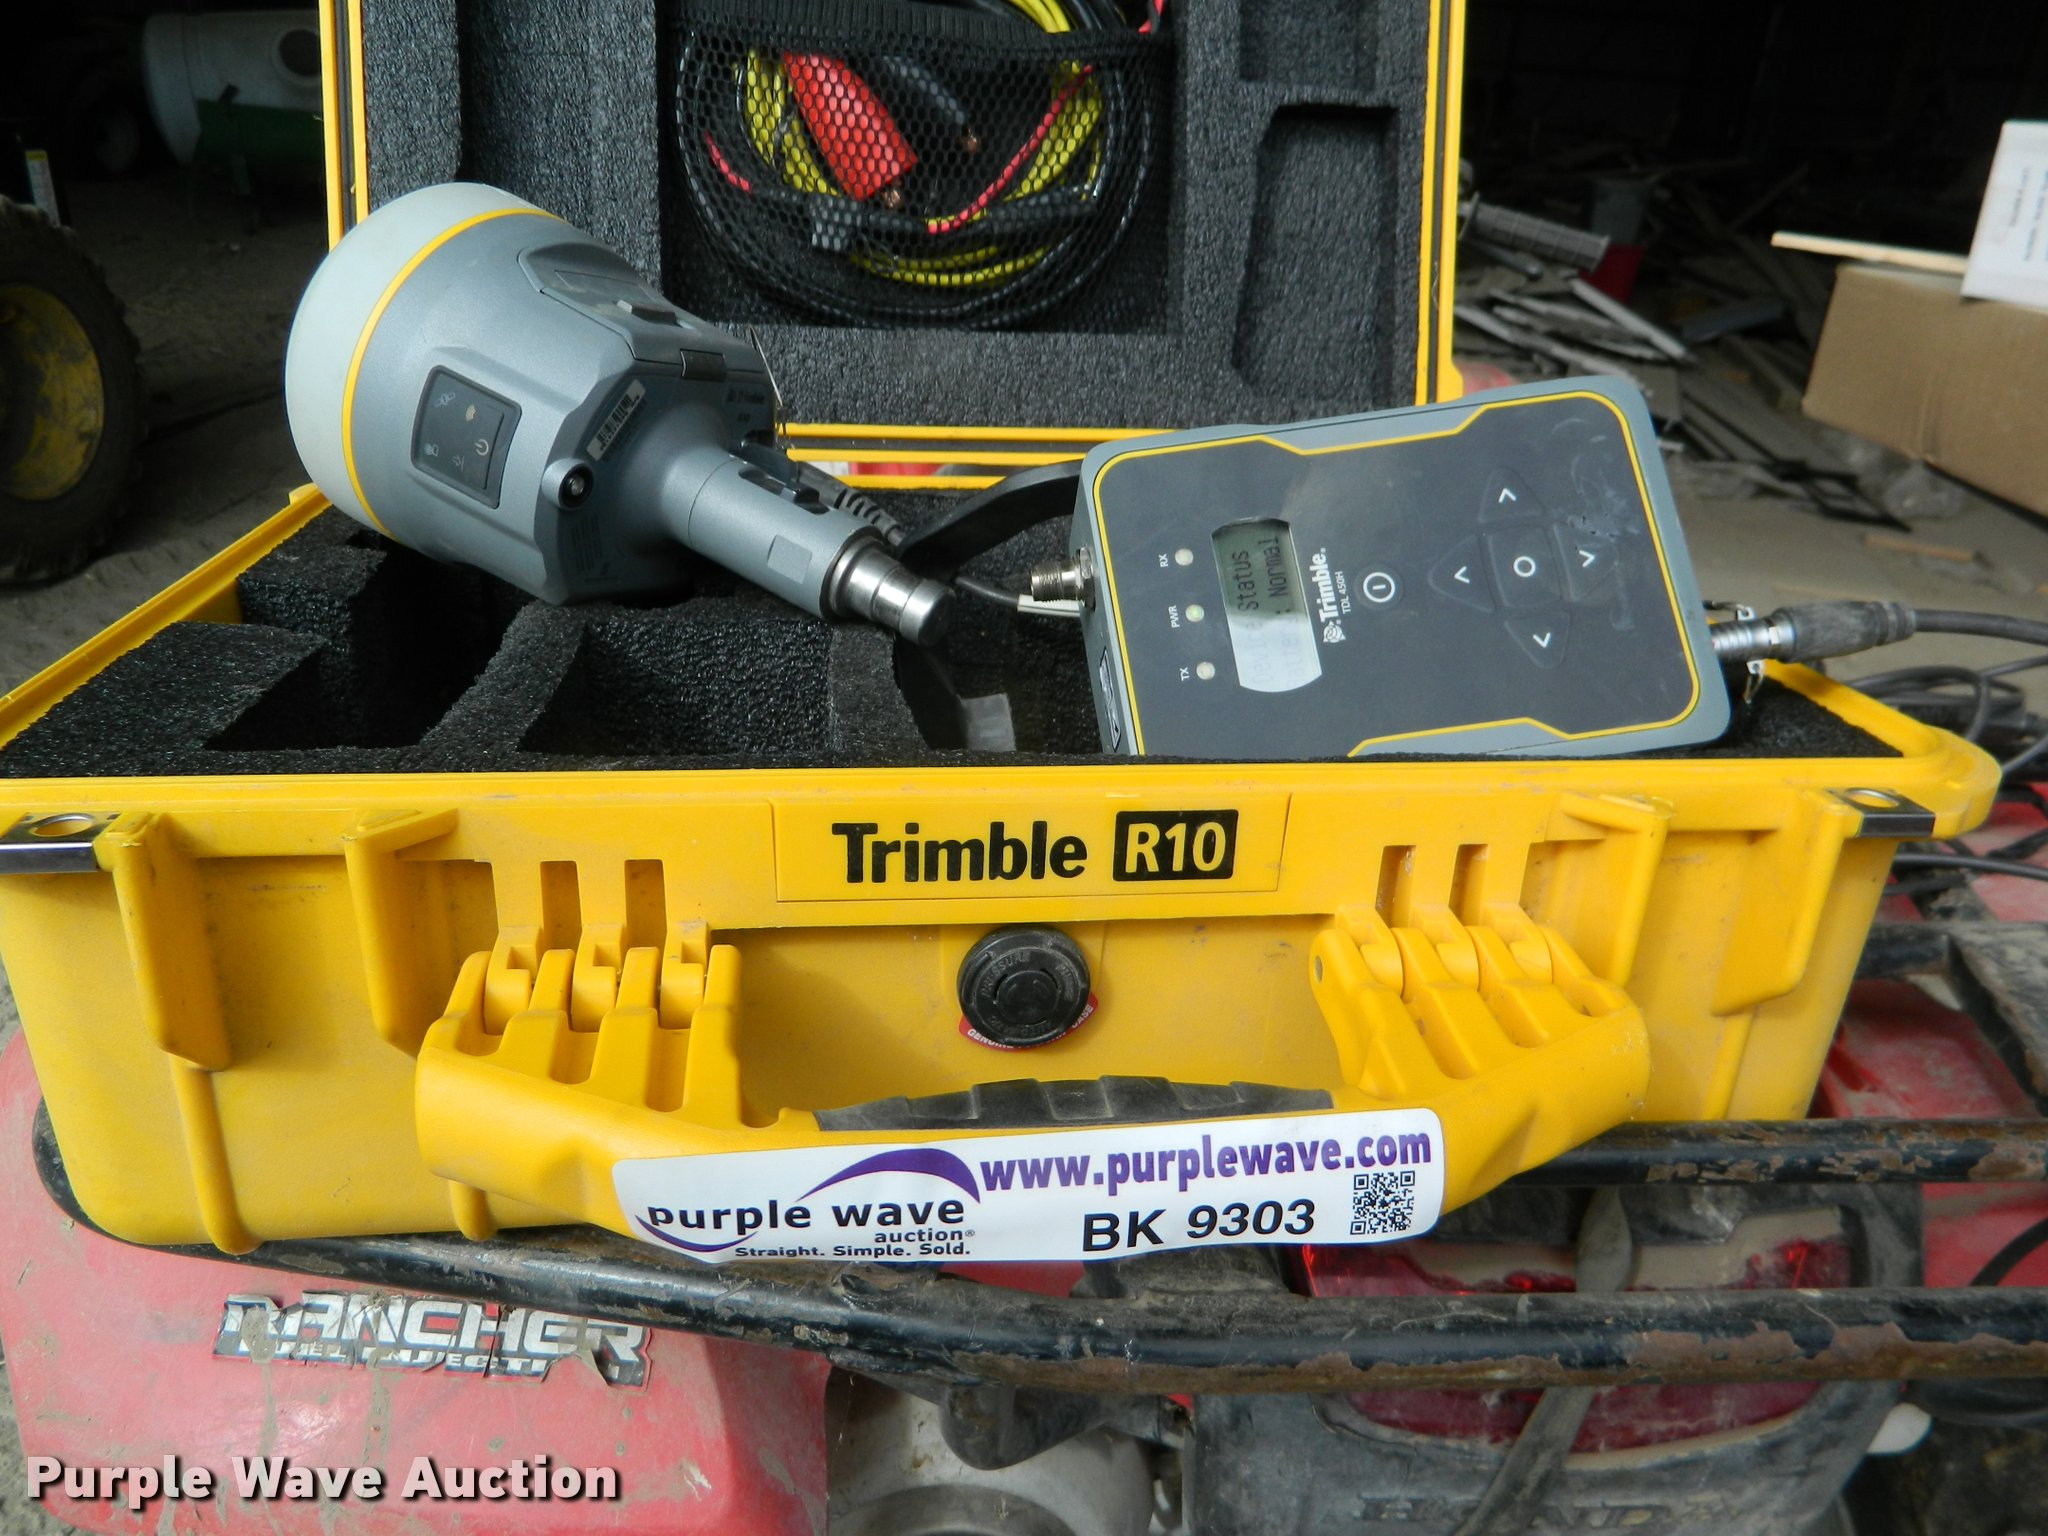 Trimble R10 GNSS surveying system | Item BK9303 | SOLD! Marc